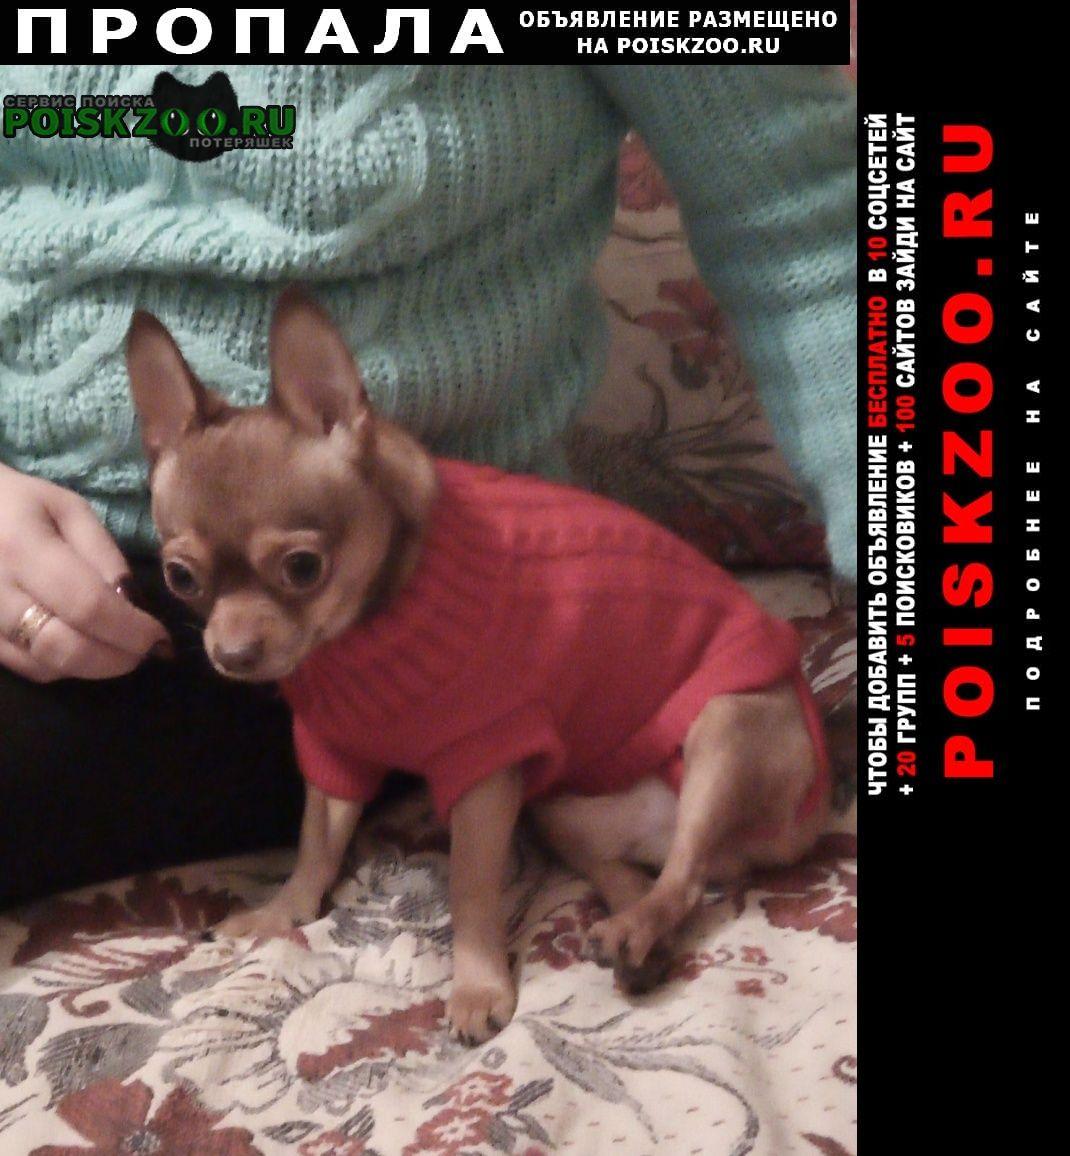 Пропала собака порода чихуахуа.зовут ричи. окрас рыжий. Курск